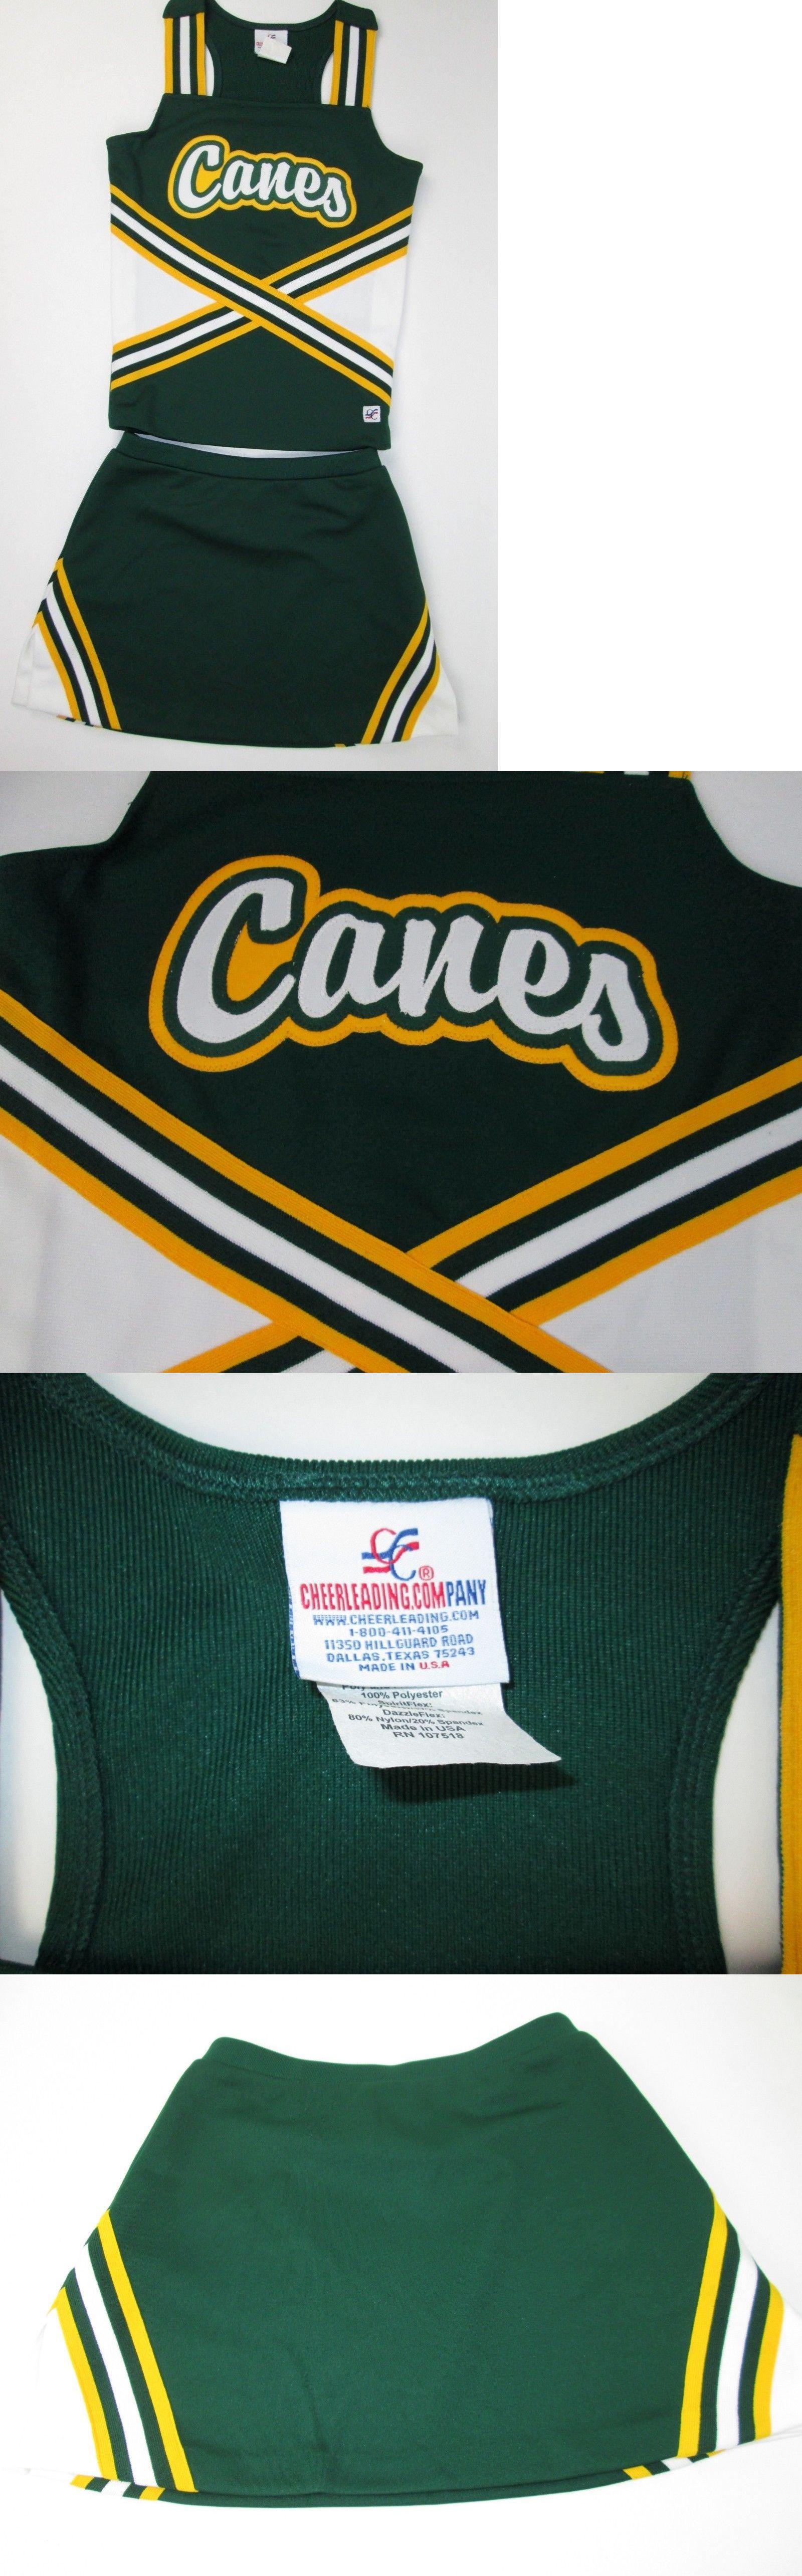 Cheerleading 66832: New Canes Cheerleader Uniform Outfit Costume 32 Chest Elastic Skirt Halloween! -> BUY IT NOW ONLY: $35 on #eBay #cheerleading #canes #cheerleader #uniform #outfit #costume #chest #elastic #skirt #cheerleaderuniform